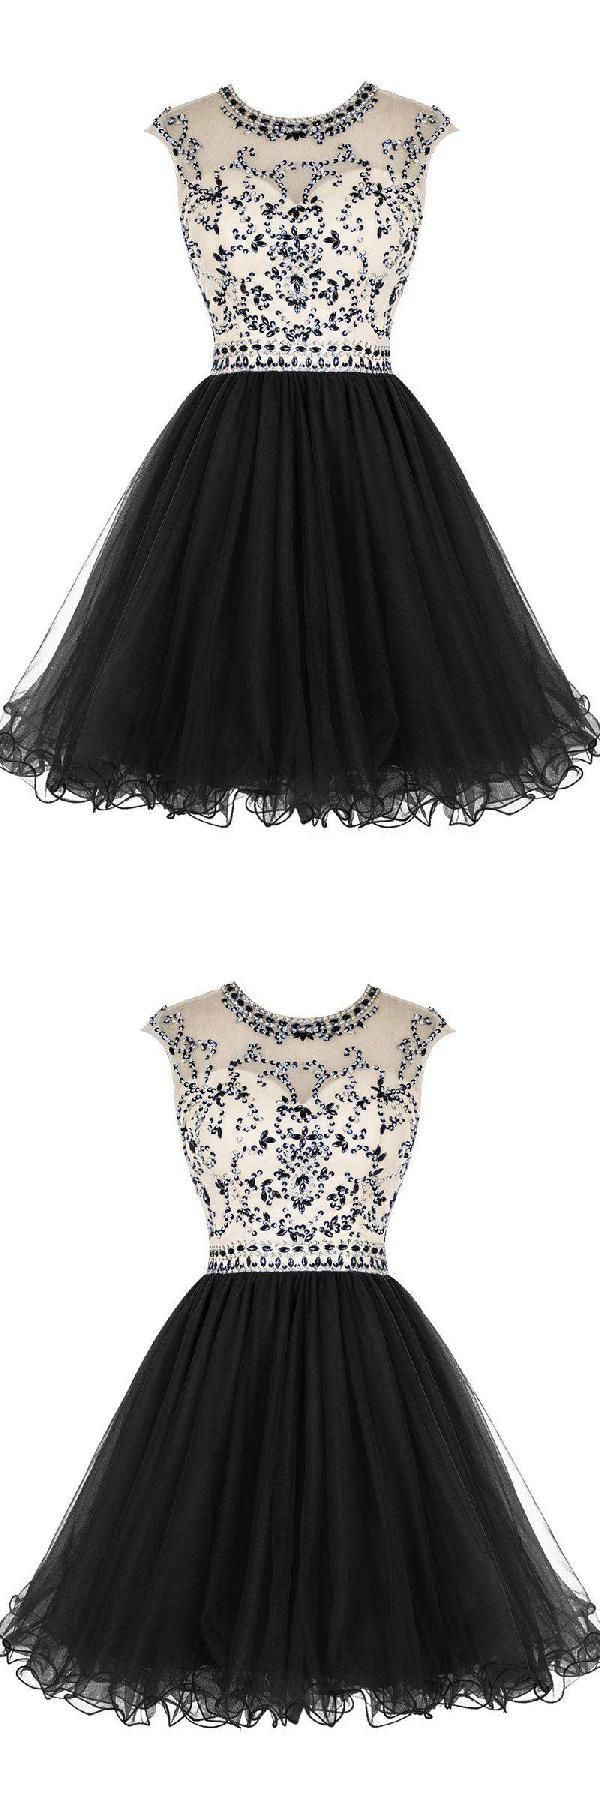 Prom dresses short sequin prom dresses black prom dresses